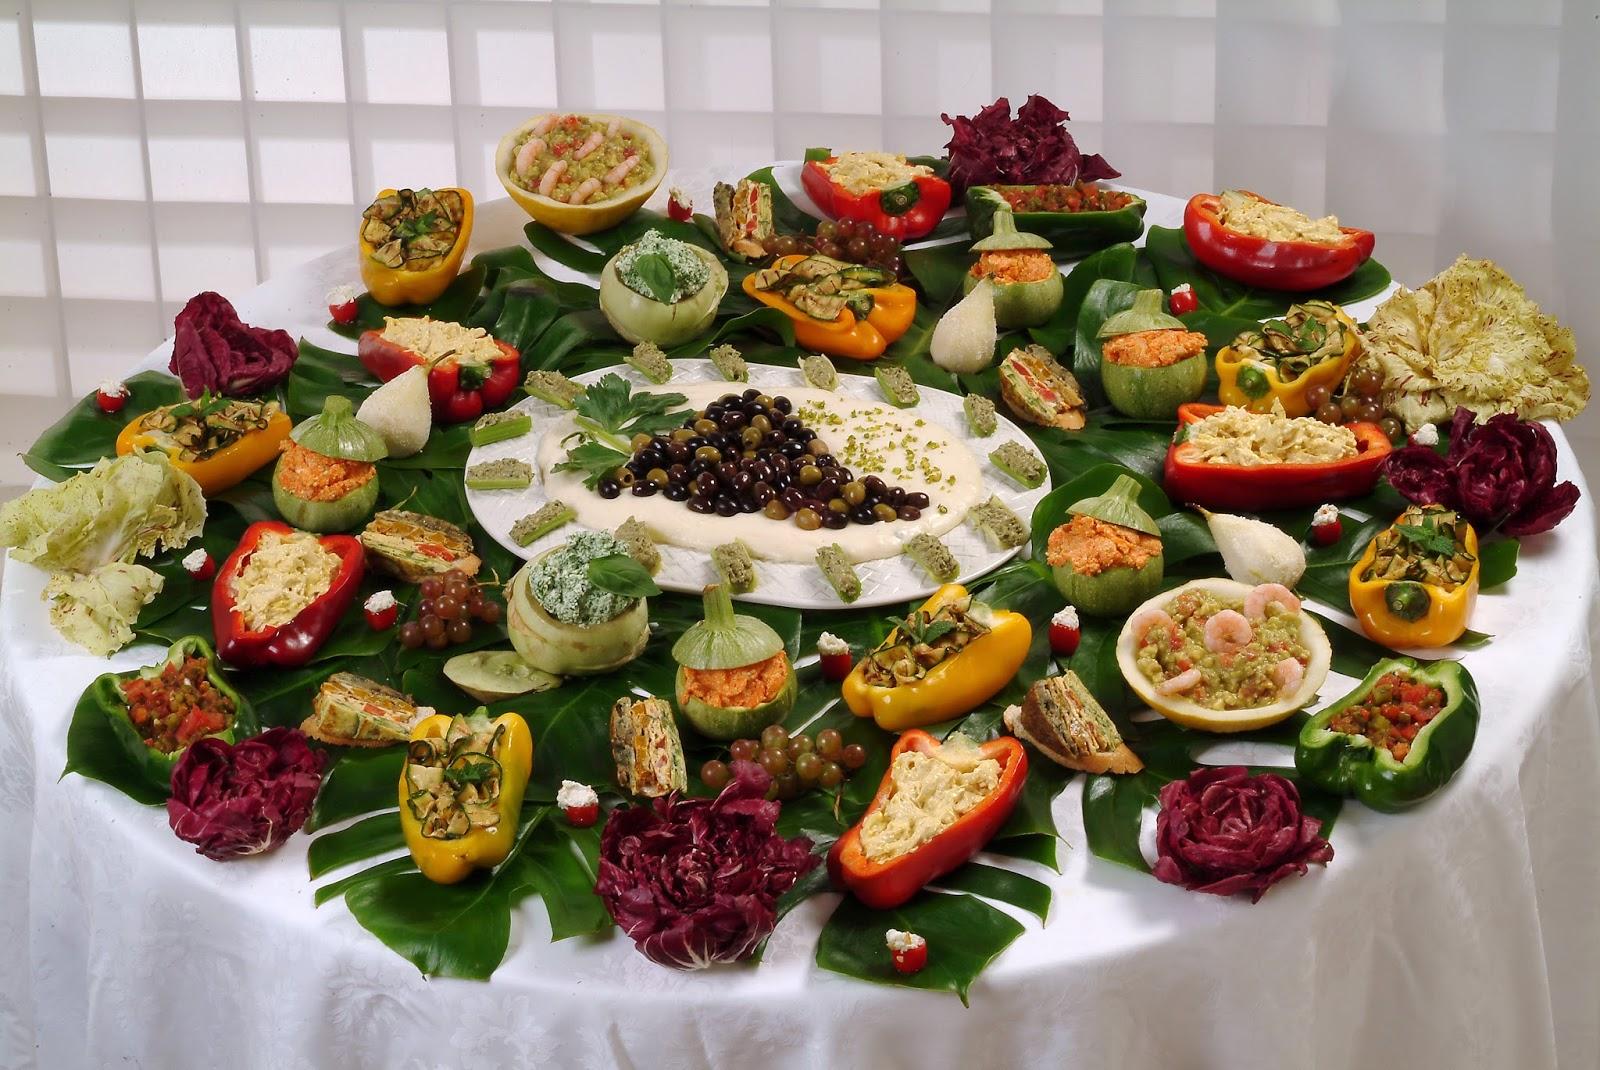 e-orchestra di cucina: Buffet per una serata estiva